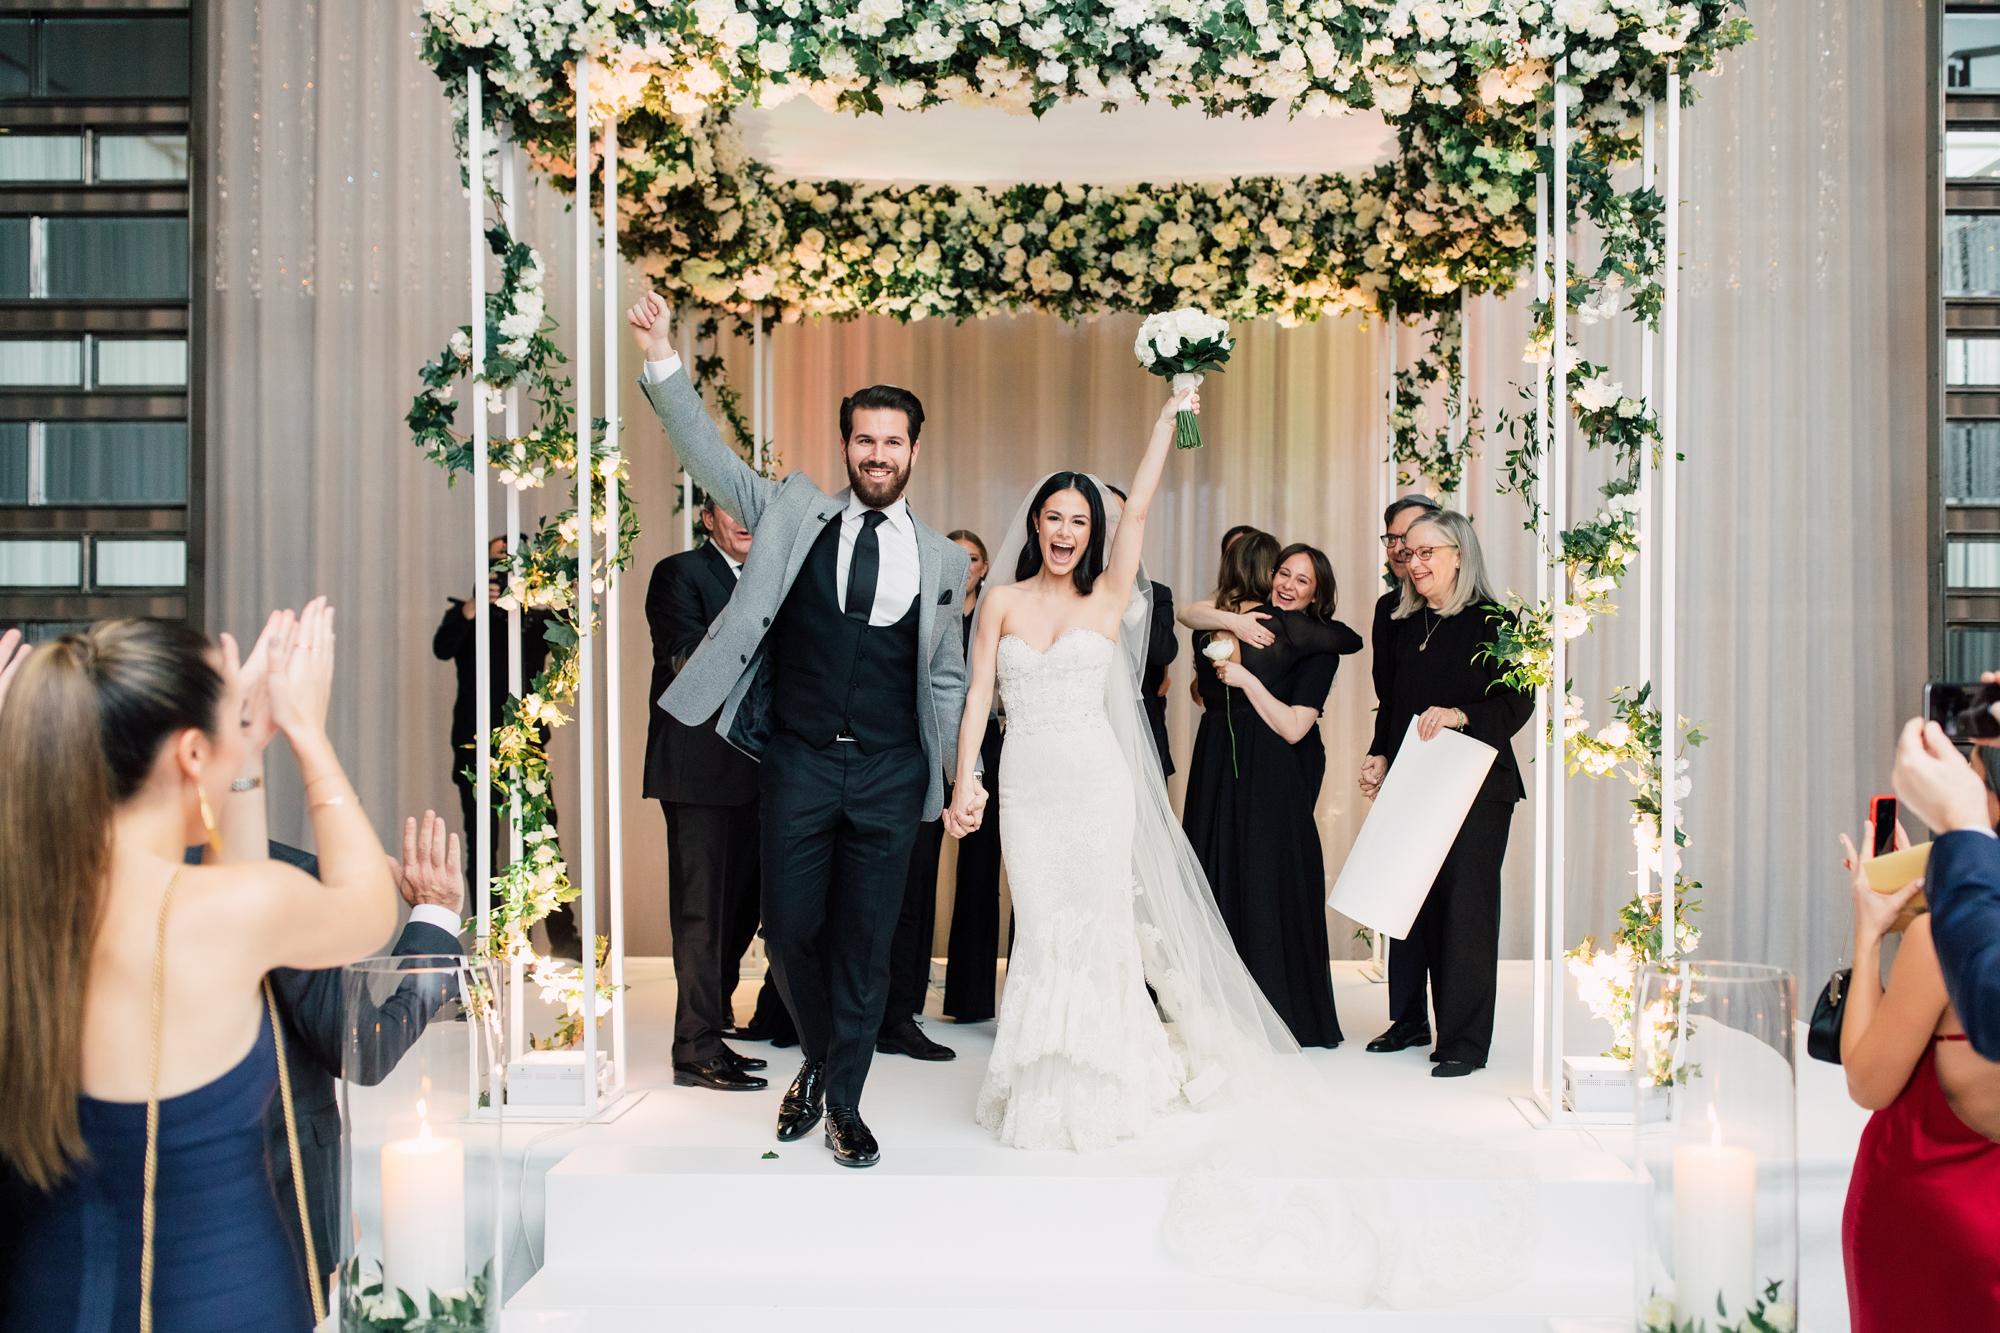 ashley lindzon wedding chuppah